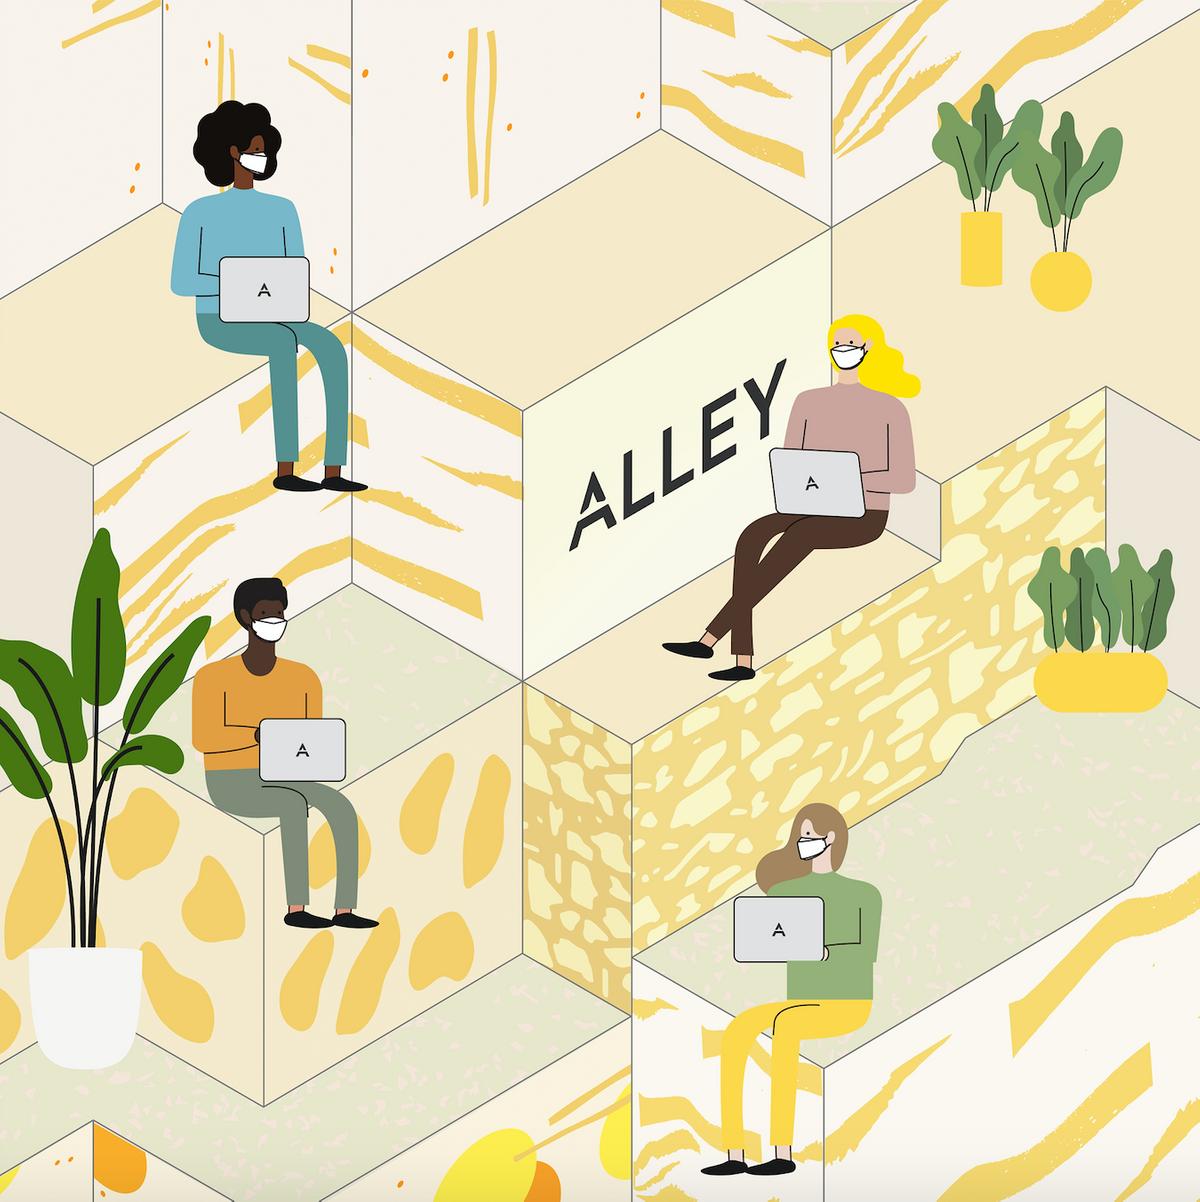 illustration of people working